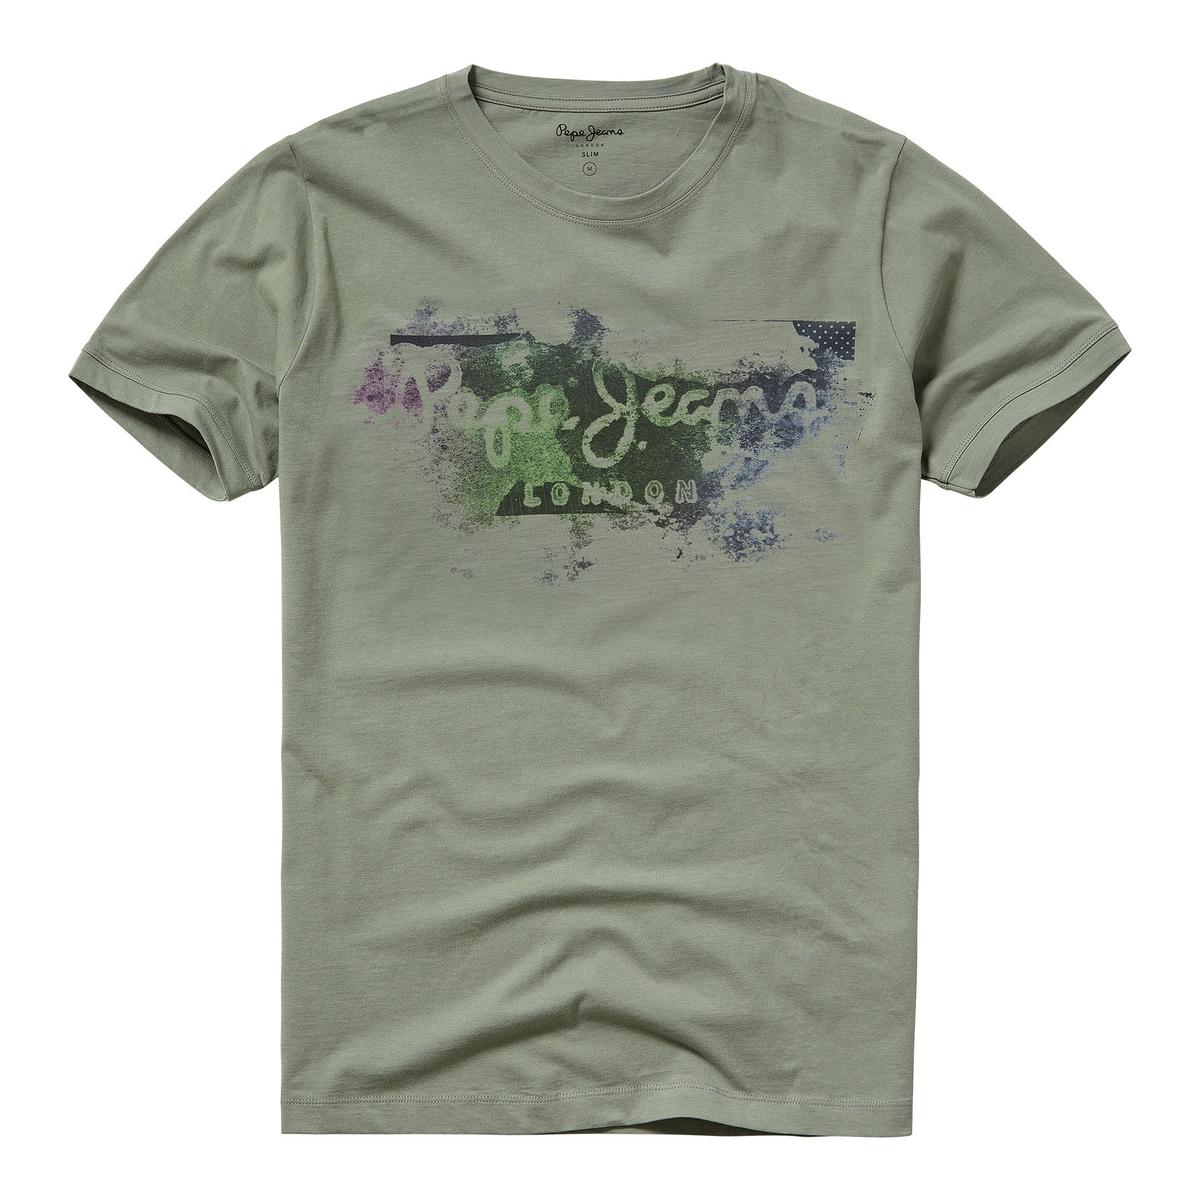 Футболка с круглым вырезом и рисунком спереди GOODGE футболка с круглым вырезом и рисунком спереди